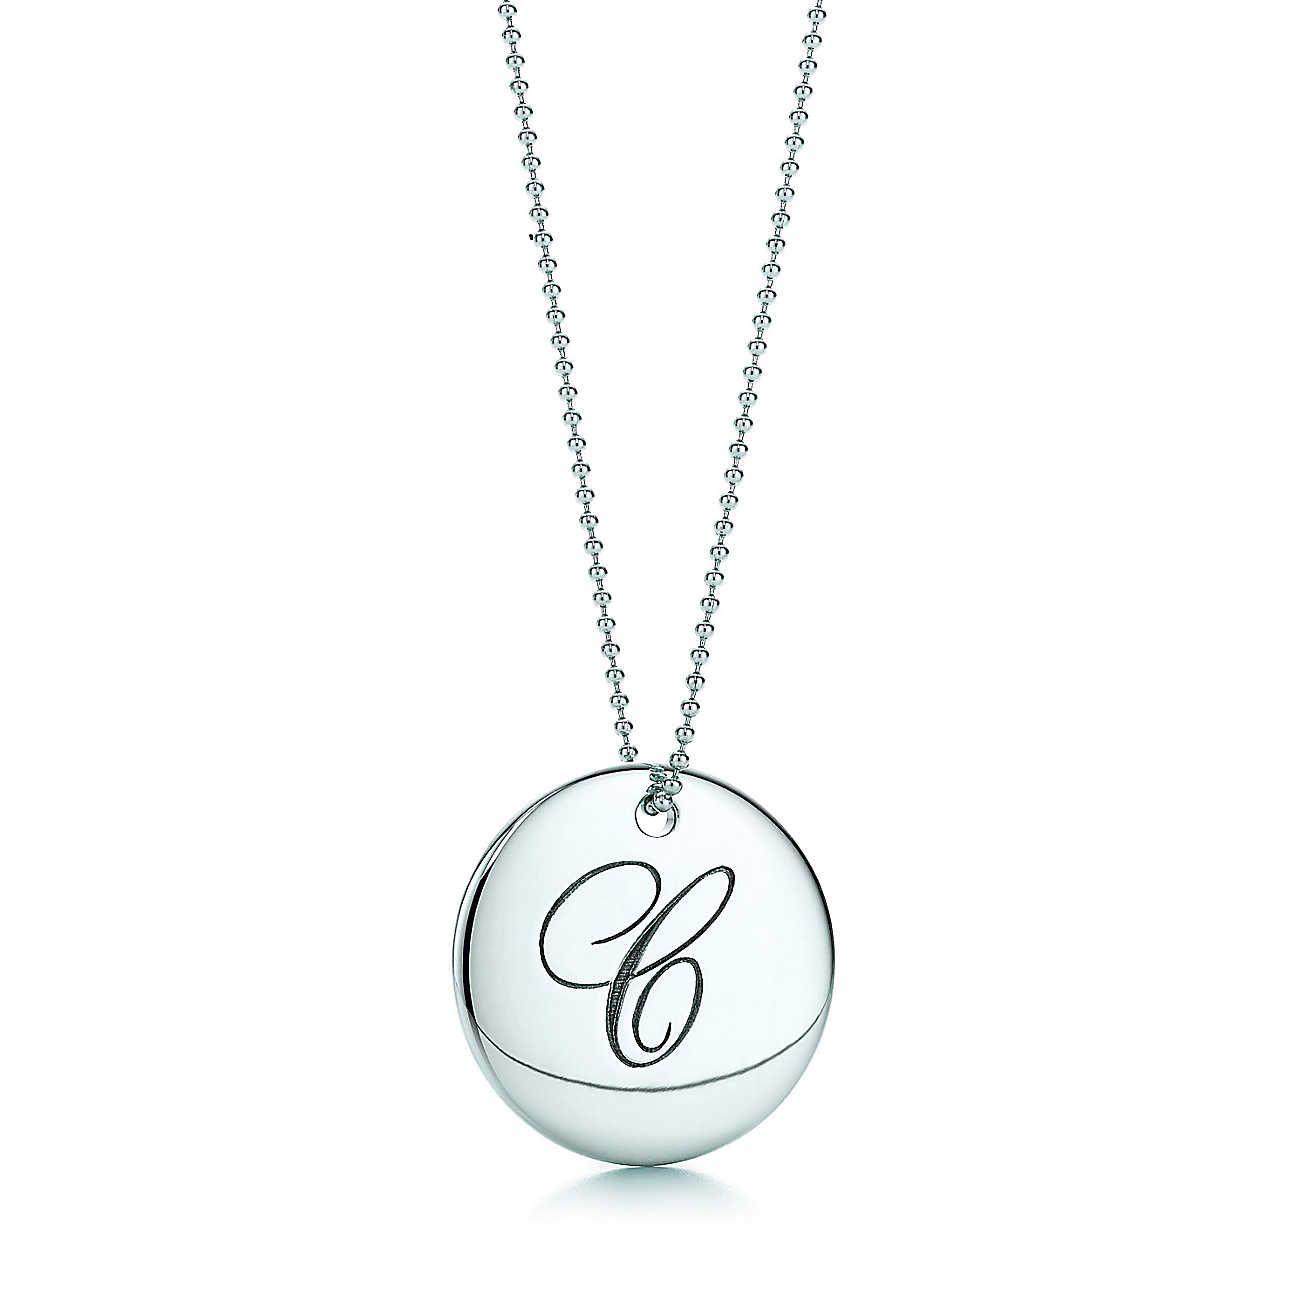 Tiffany notesletter f round pendant round pendant tiffany and tiffany notesletter c round pendant aloadofball Gallery